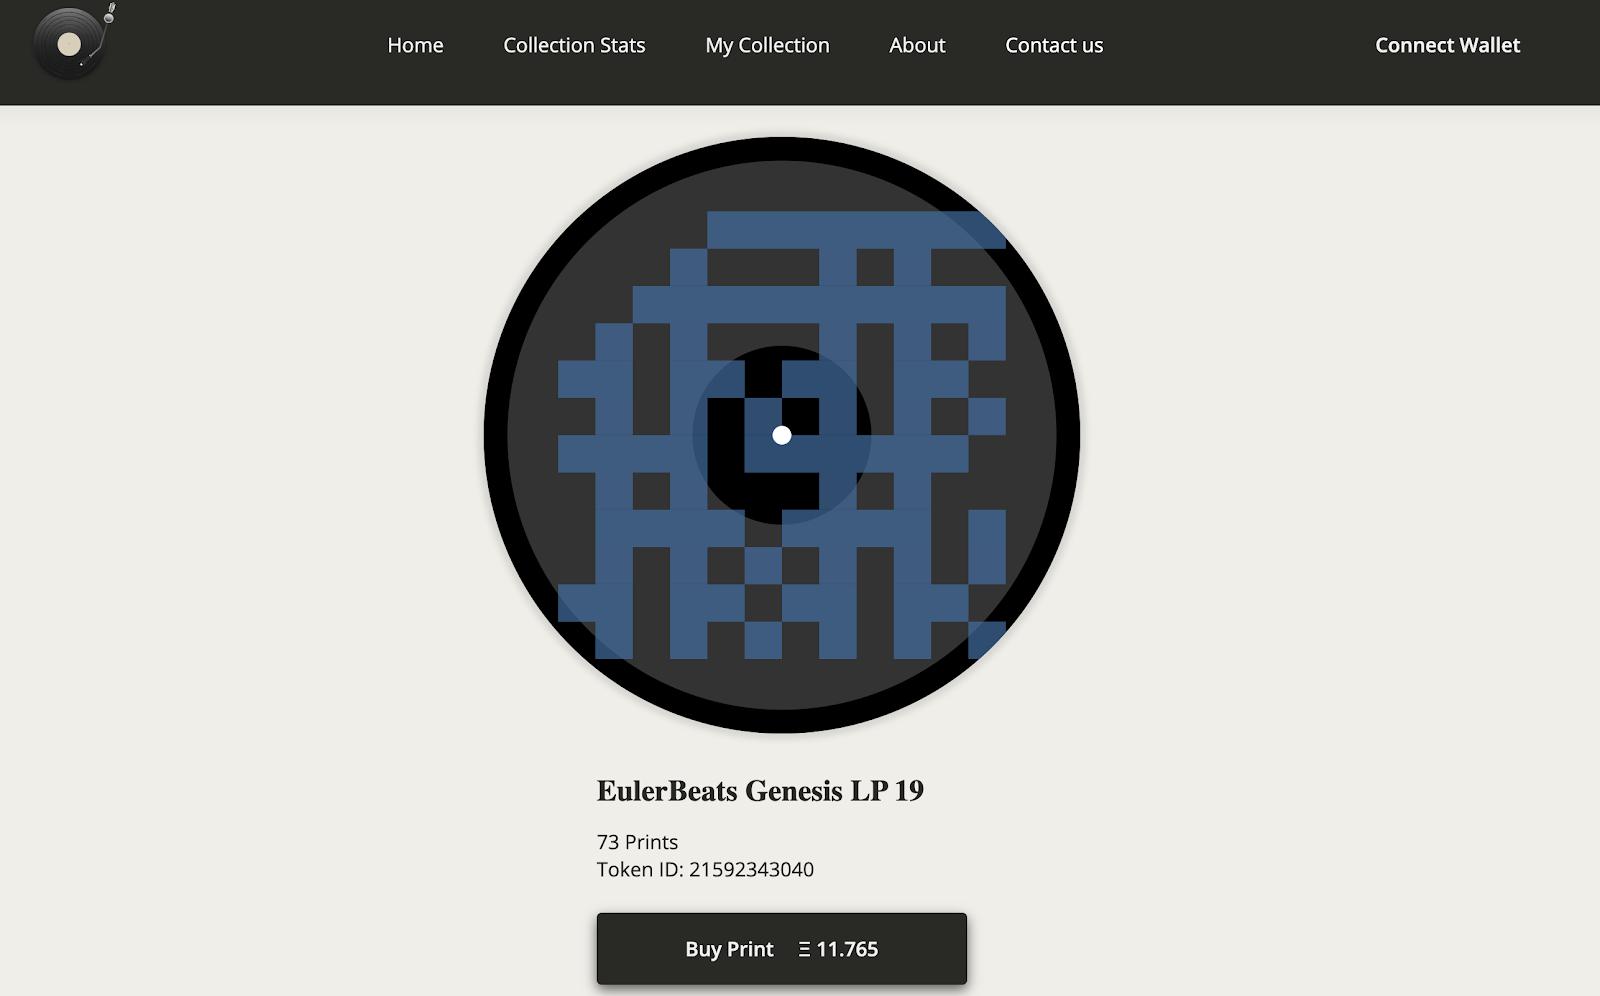 EulerBeats Genesis LP 19